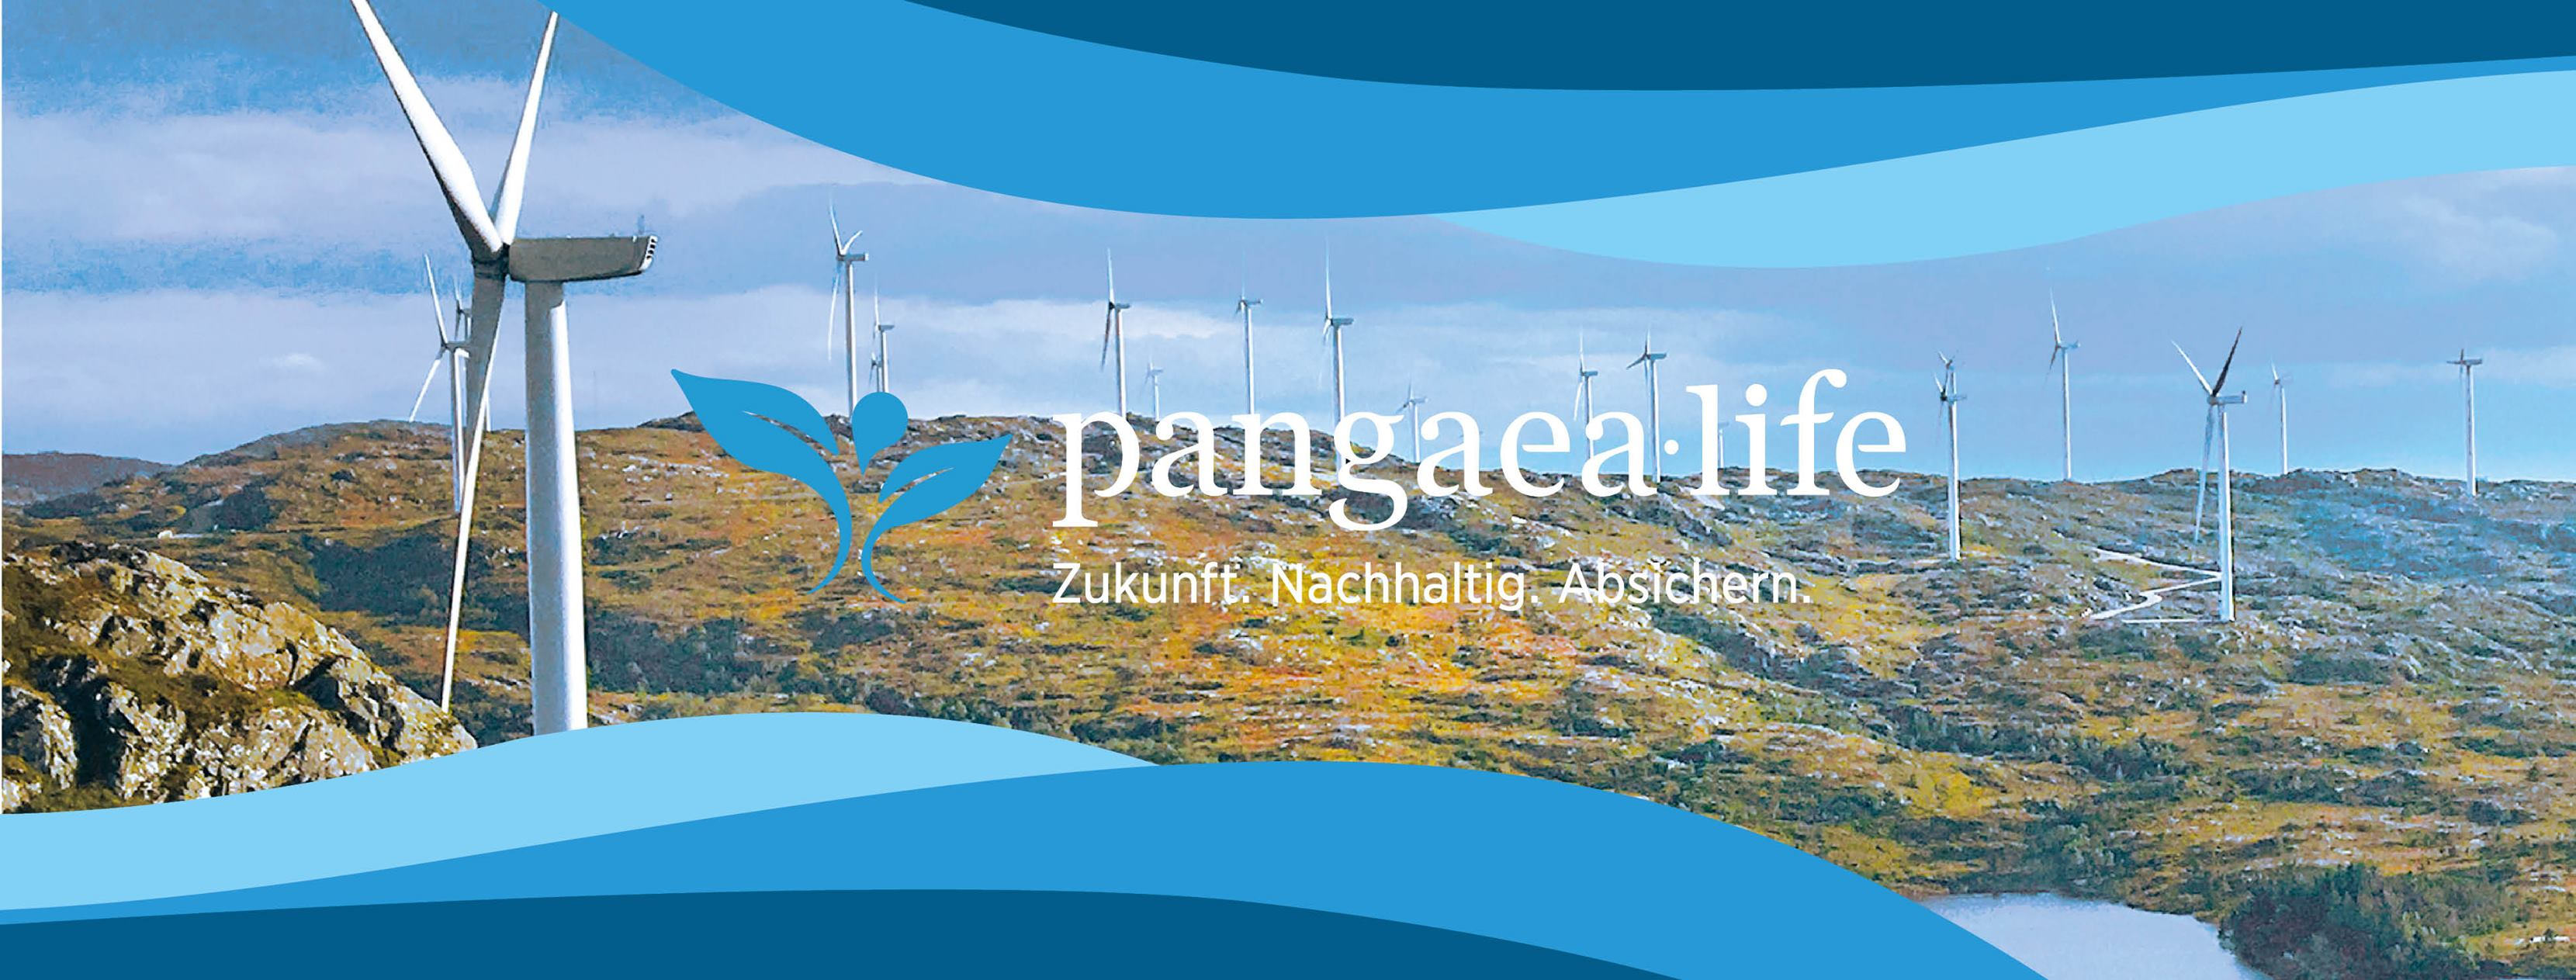 Pangaea Life 新能源基金